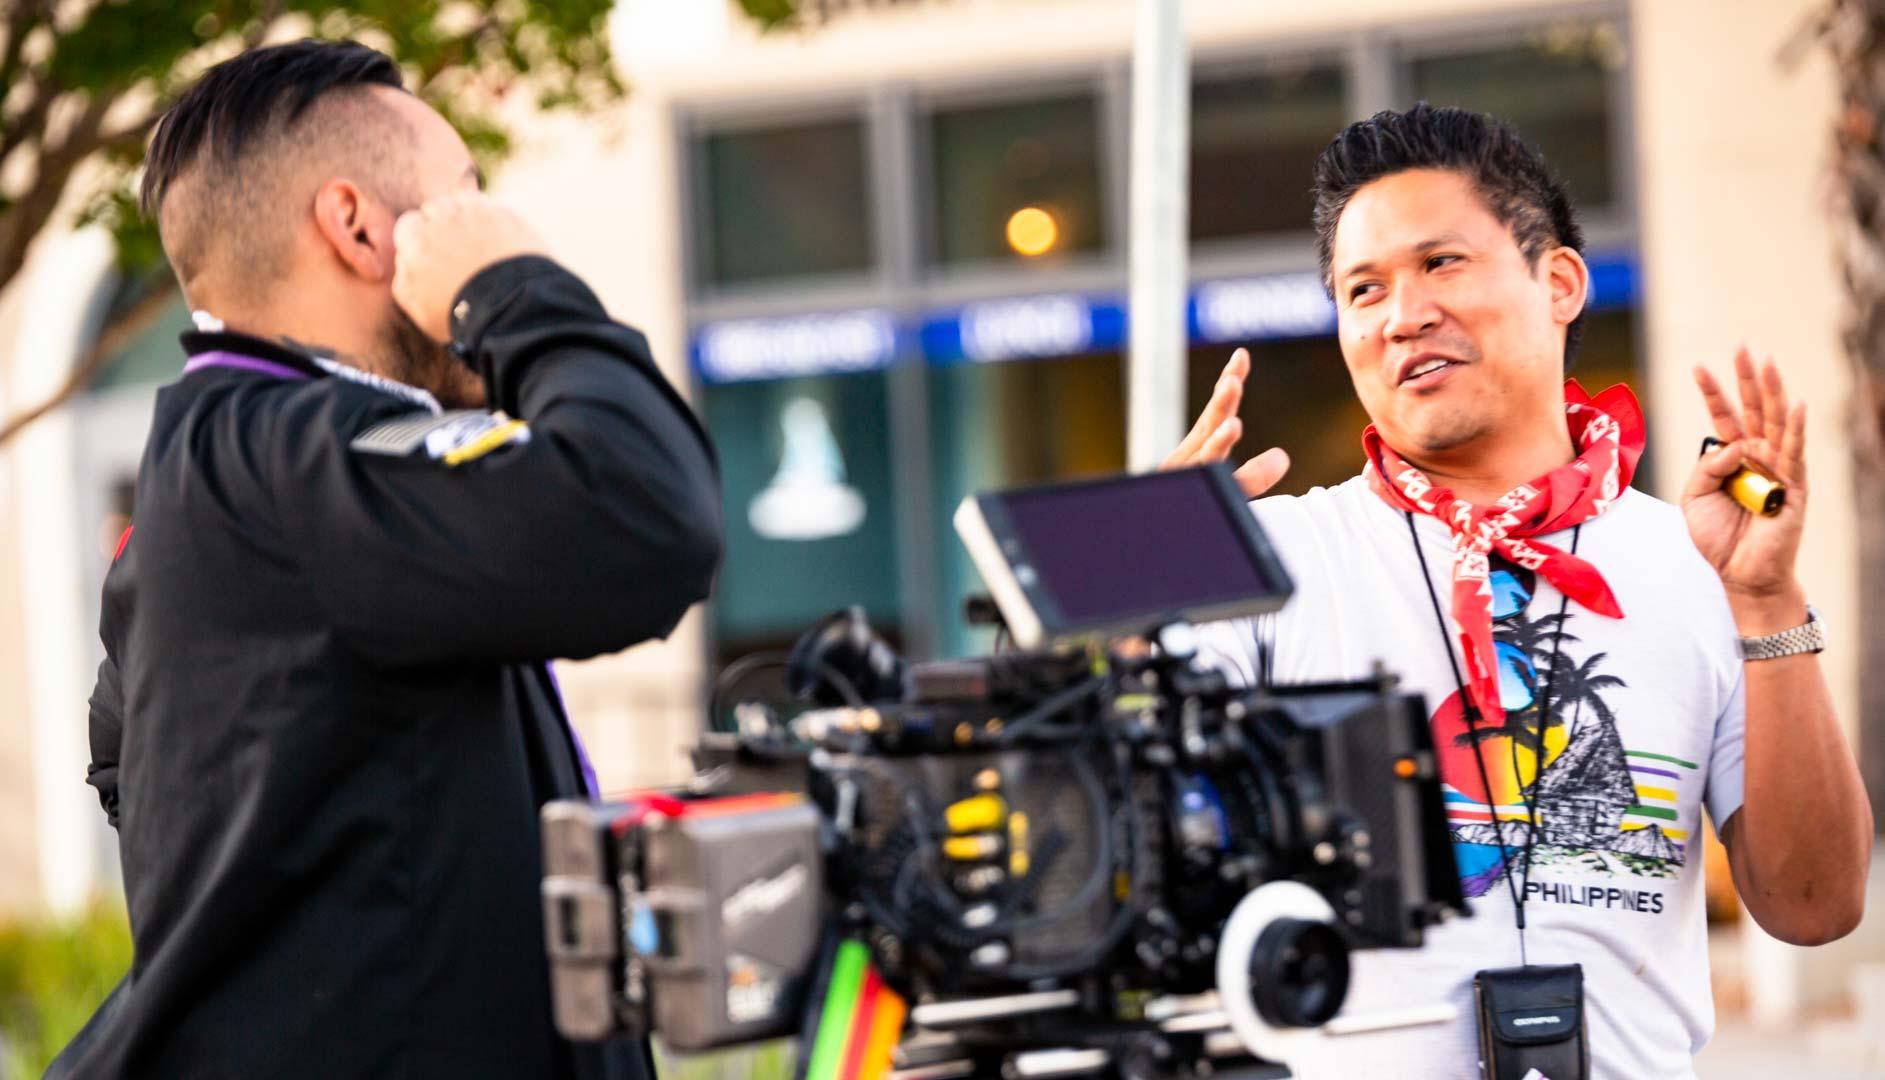 Director Dante Basco